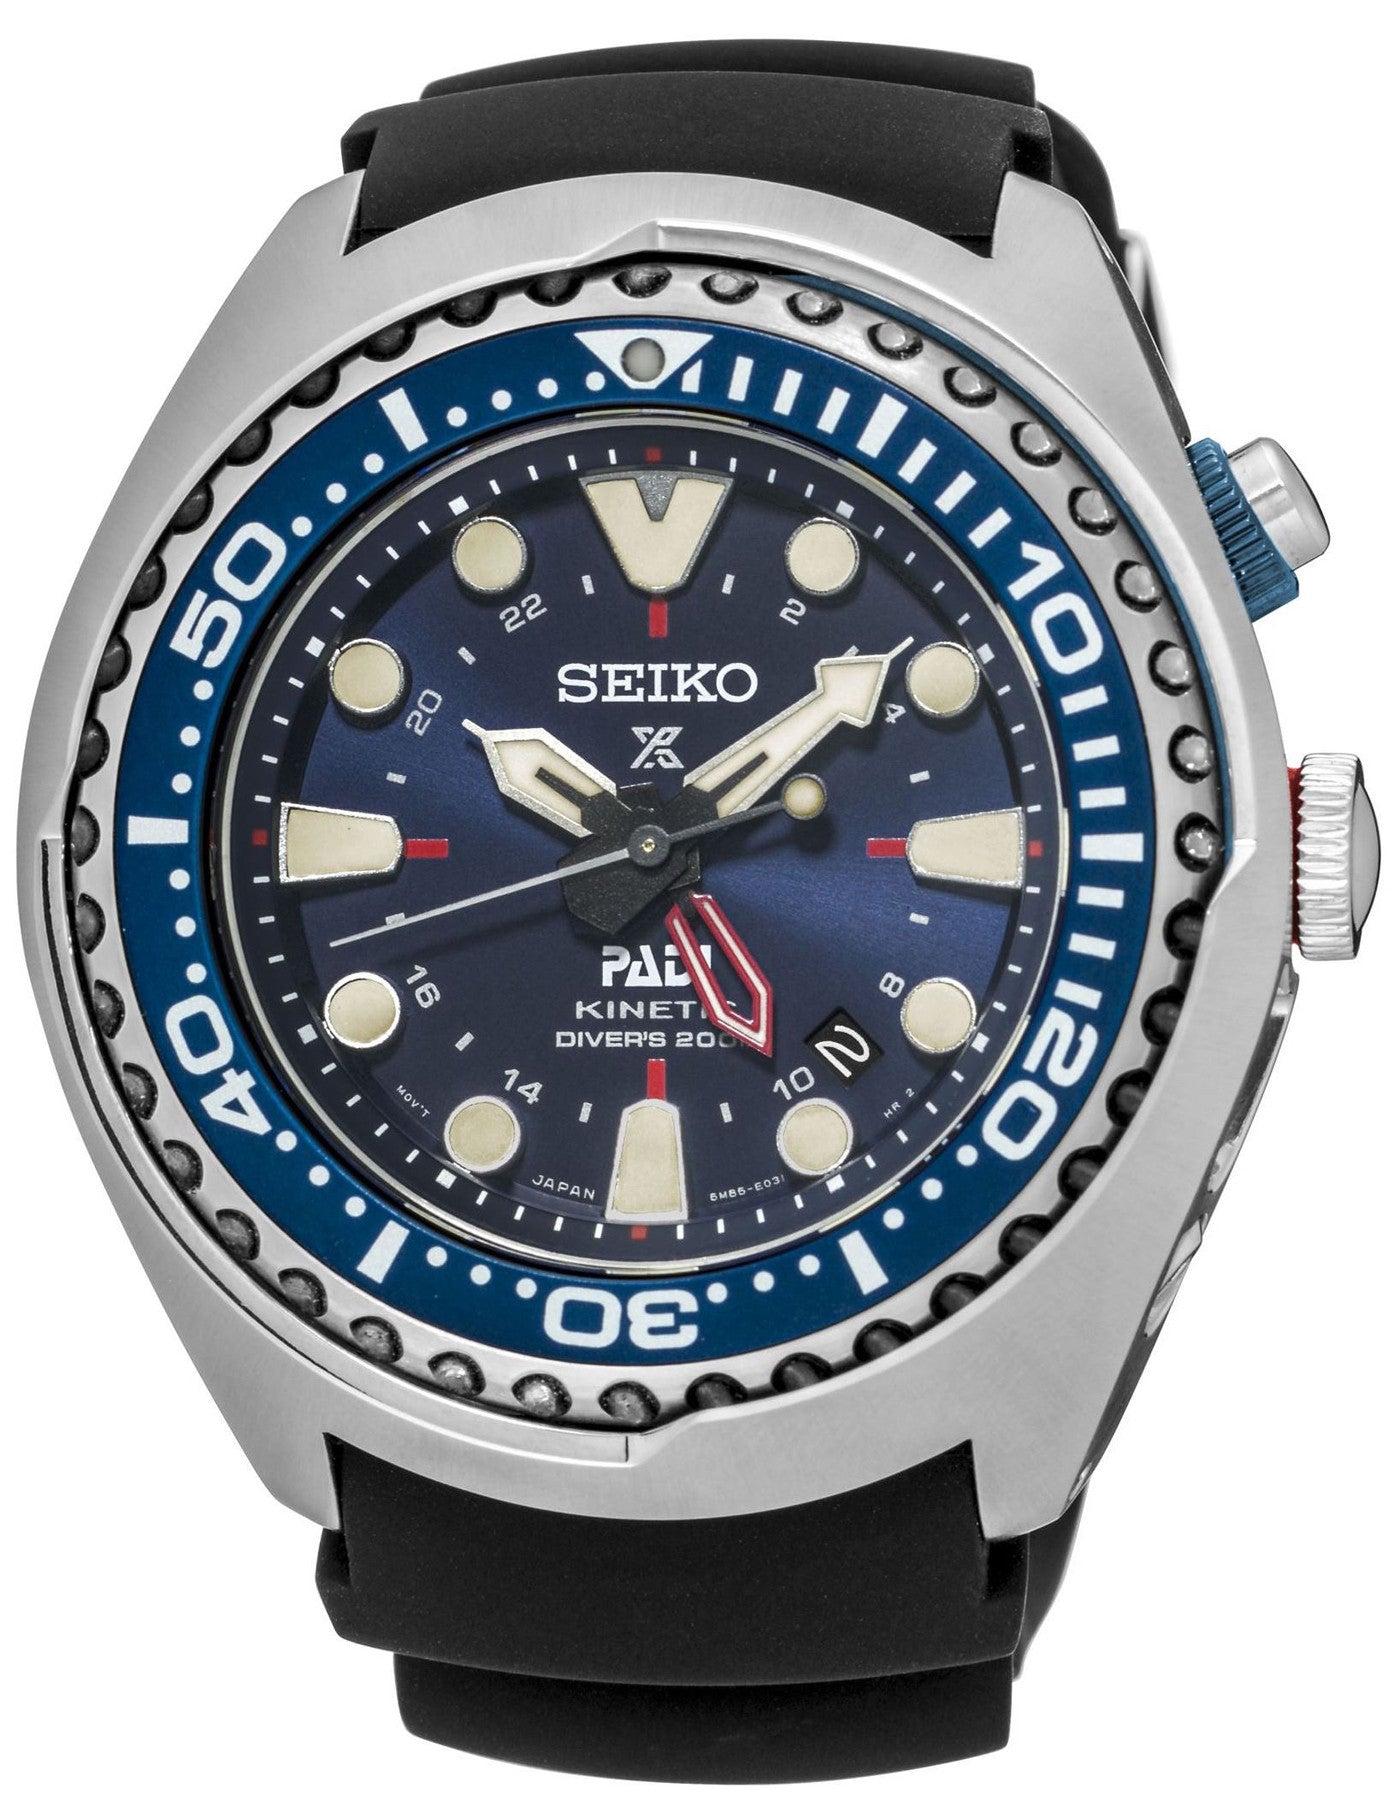 seiko kinetic divers watch manual